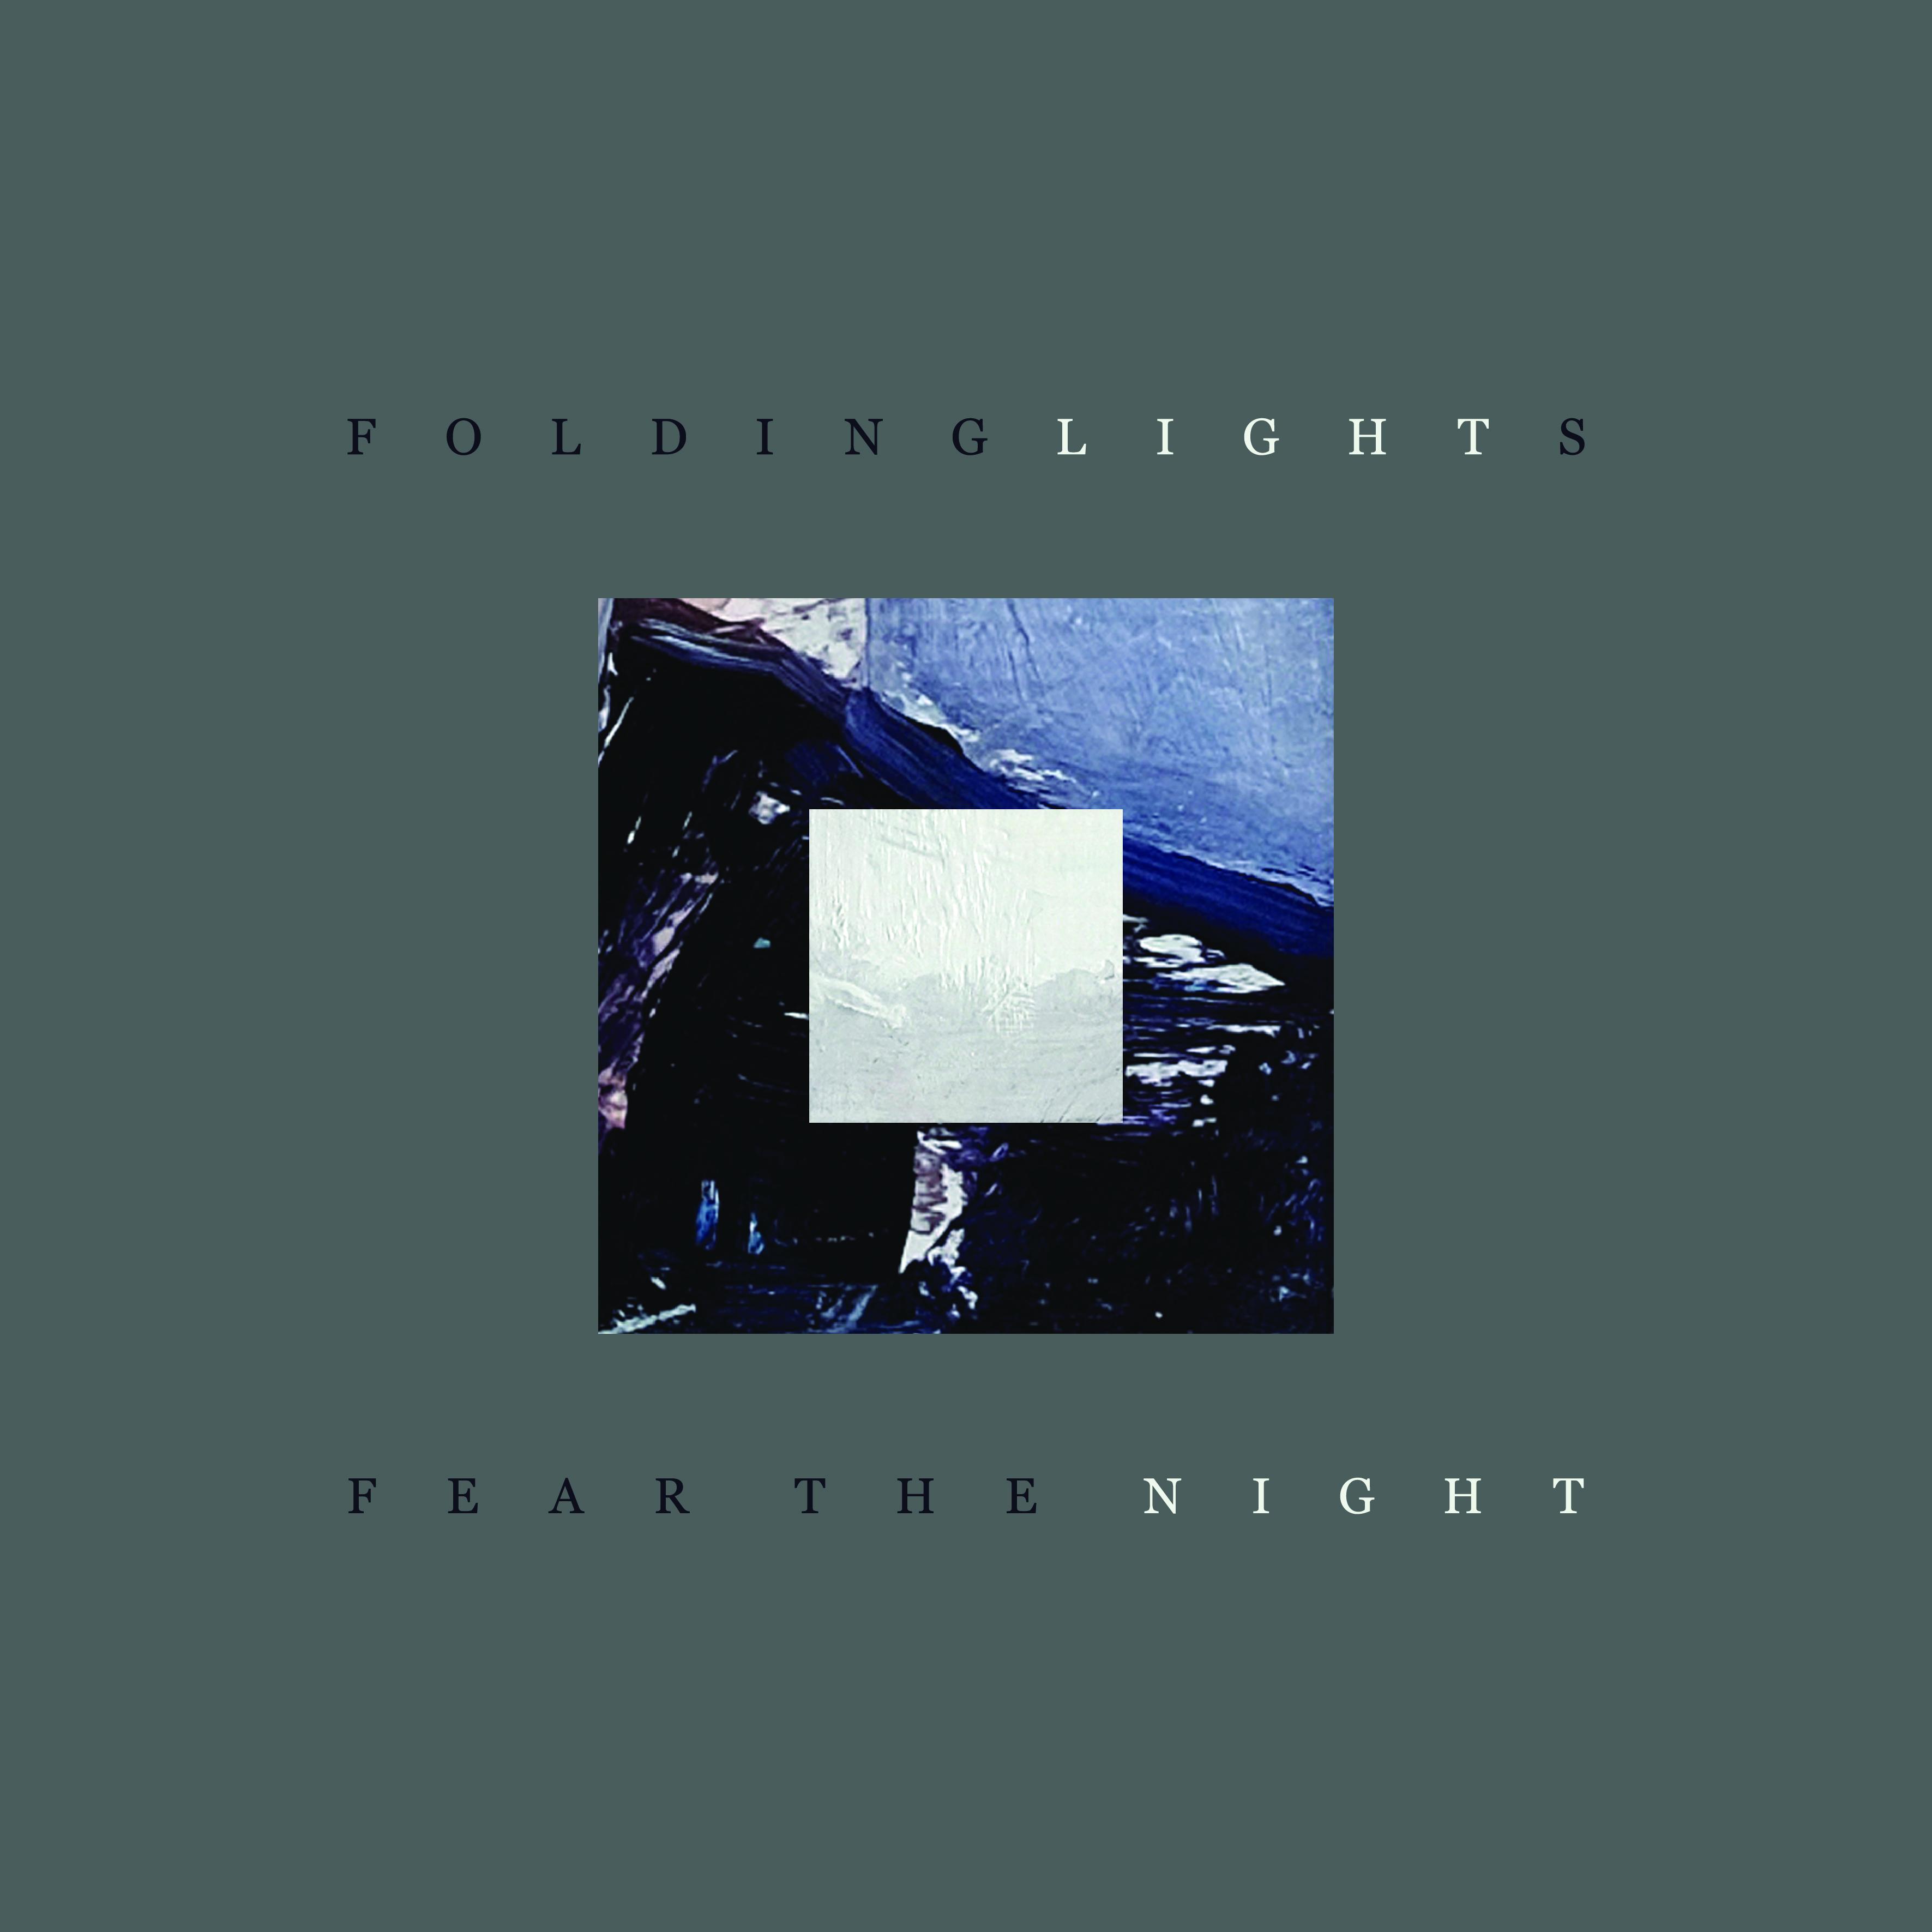 FEAR THE NIGHT SINGLE